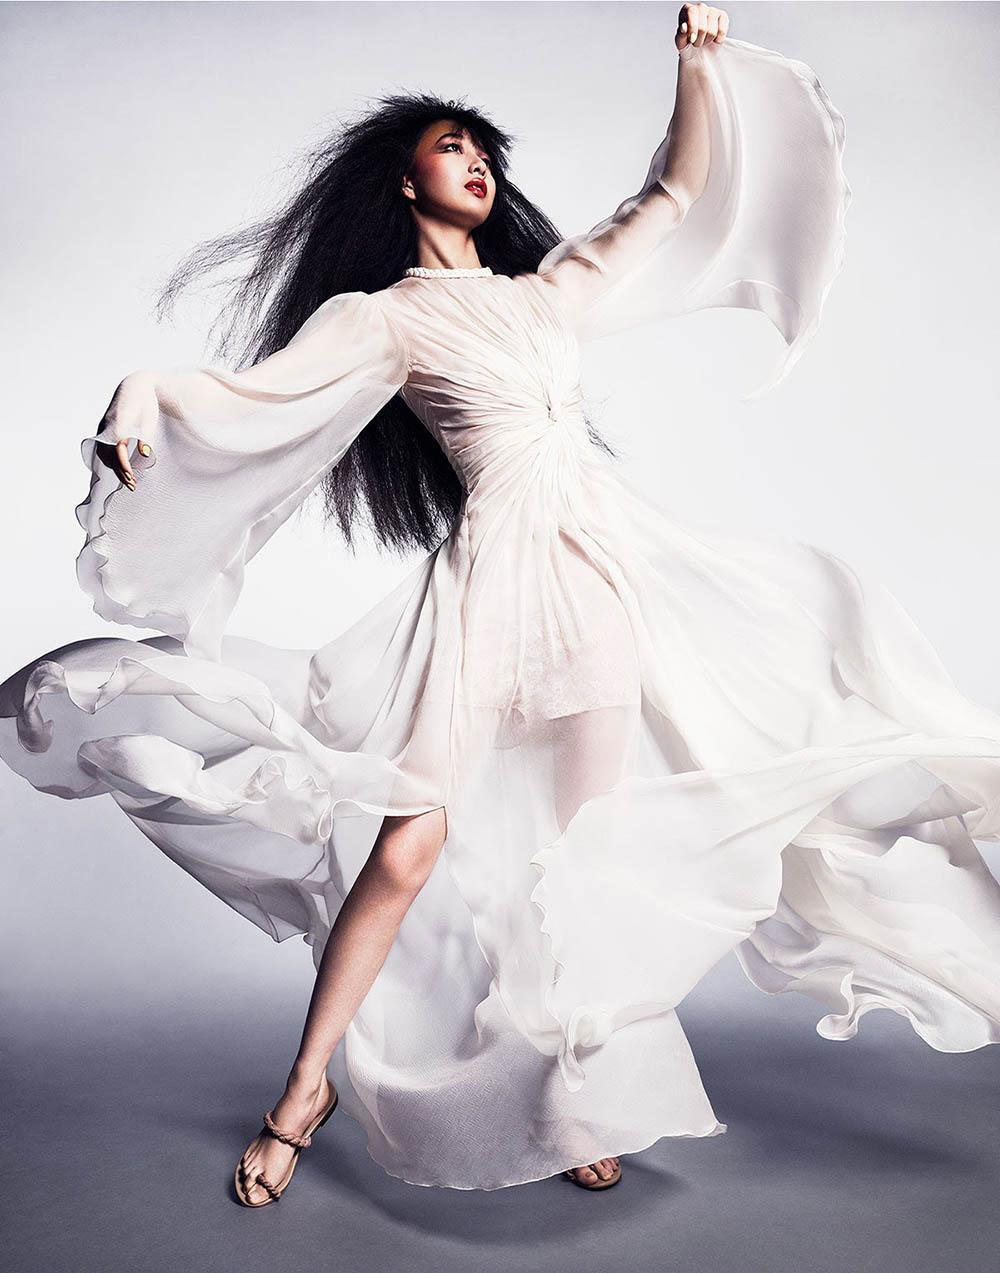 Cocomi covers Vogue Japan May 2020 by Luigi & Iango